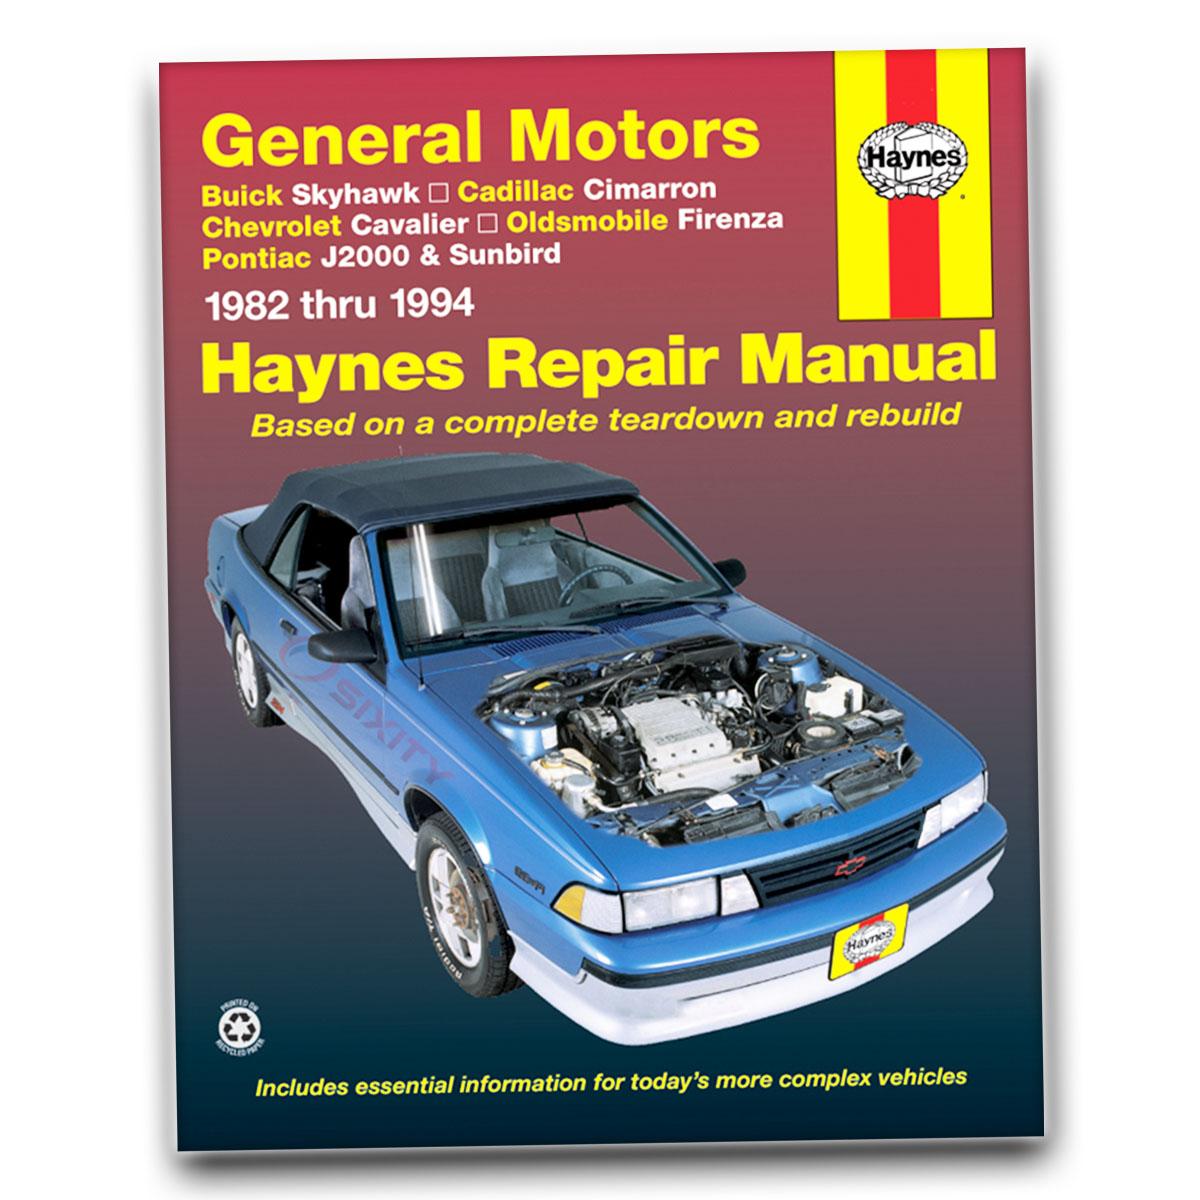 sunbird haynes repair manual pontiac j2000 le tienda garaje servicio rh ebay com 1985 Pontiac Sunbird 1998 Pontiac Sunbird